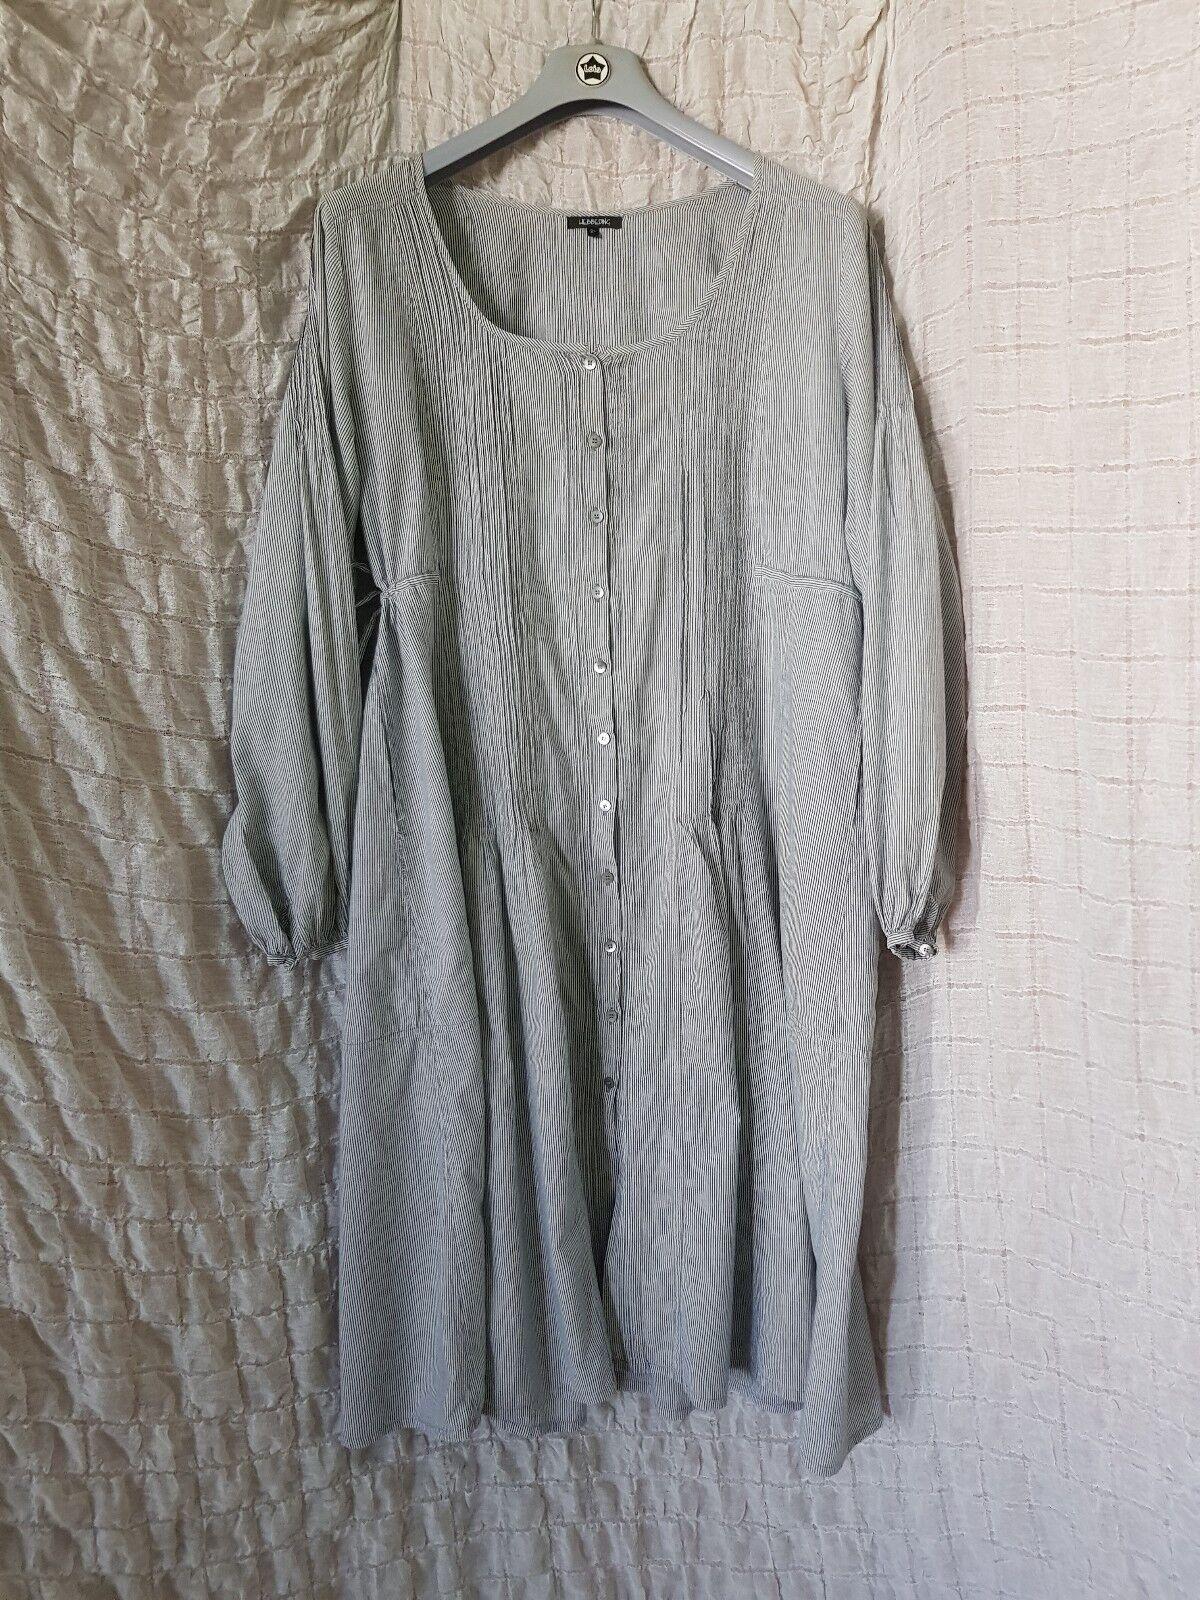 Hebbeding grey stripe stripe stripe 100% cotton puff long sleeve full front buttoned dress 2XL b13e11